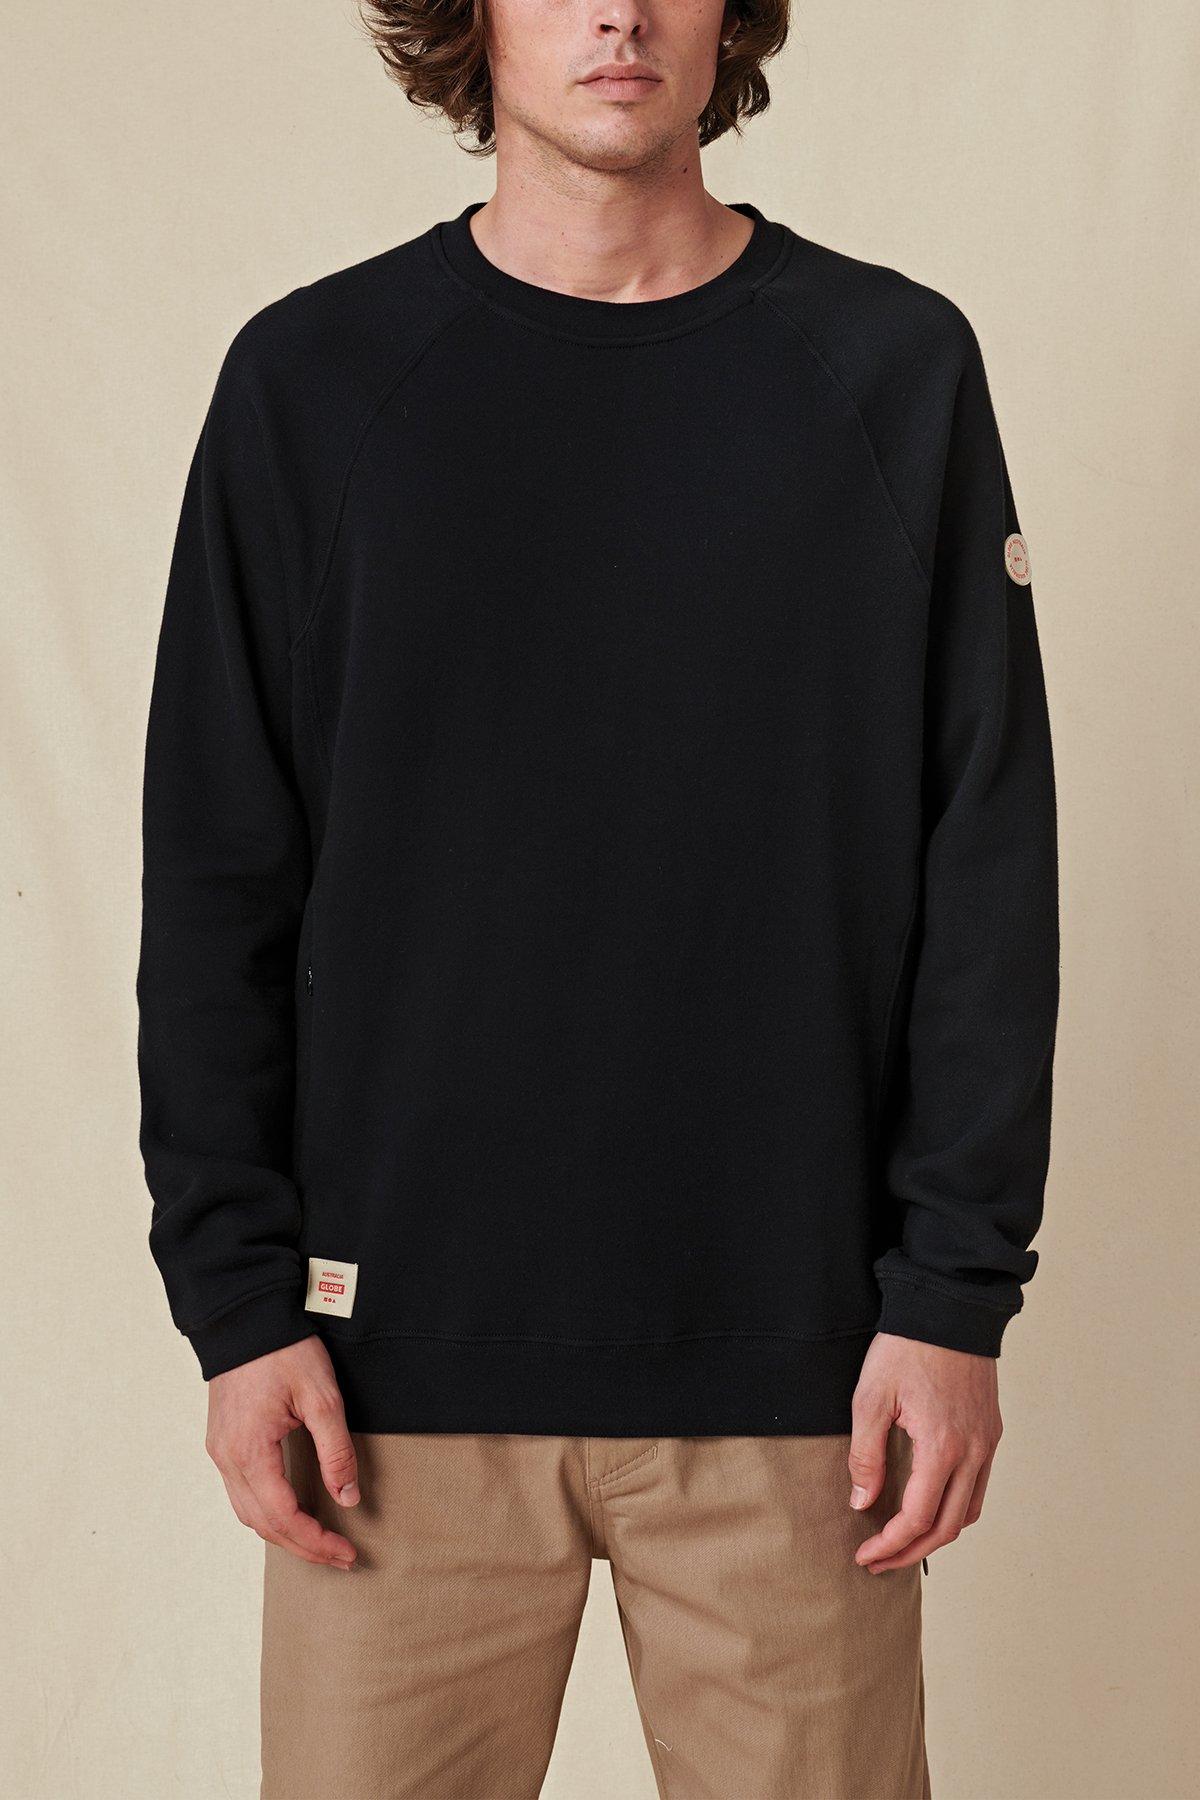 GLOBE-TRAVELLER-CREW-SWEATER-Pullover-black